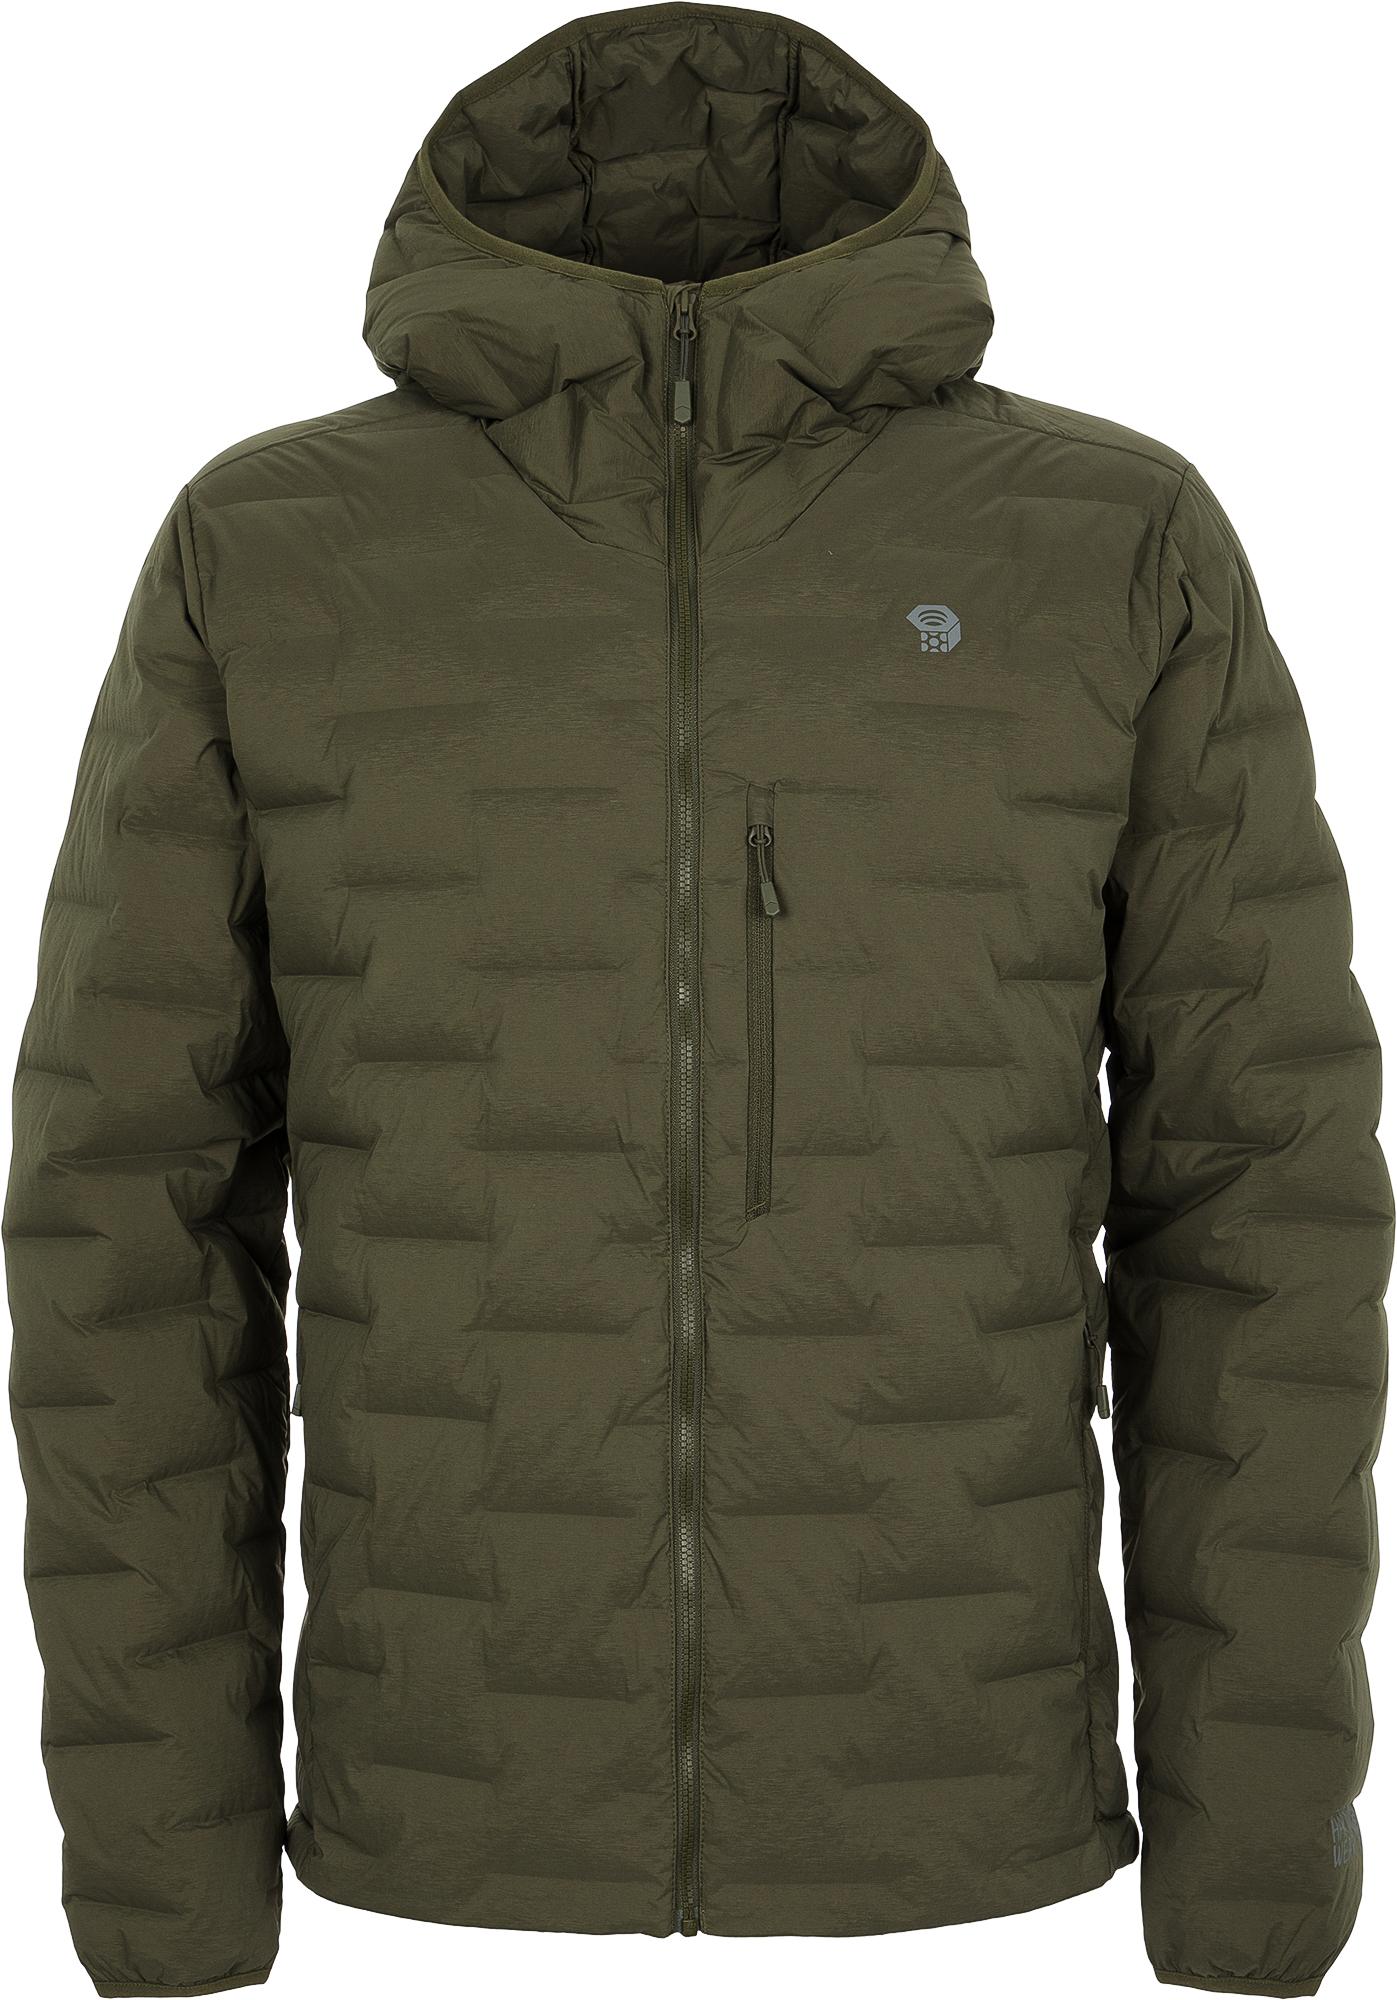 Mountain Hardwear Куртка пуховая мужская Mountain Hardwear Super/DS™, размер 56 mountain hardwear куртка утепленная мужская mountain hardwear radian размер 56